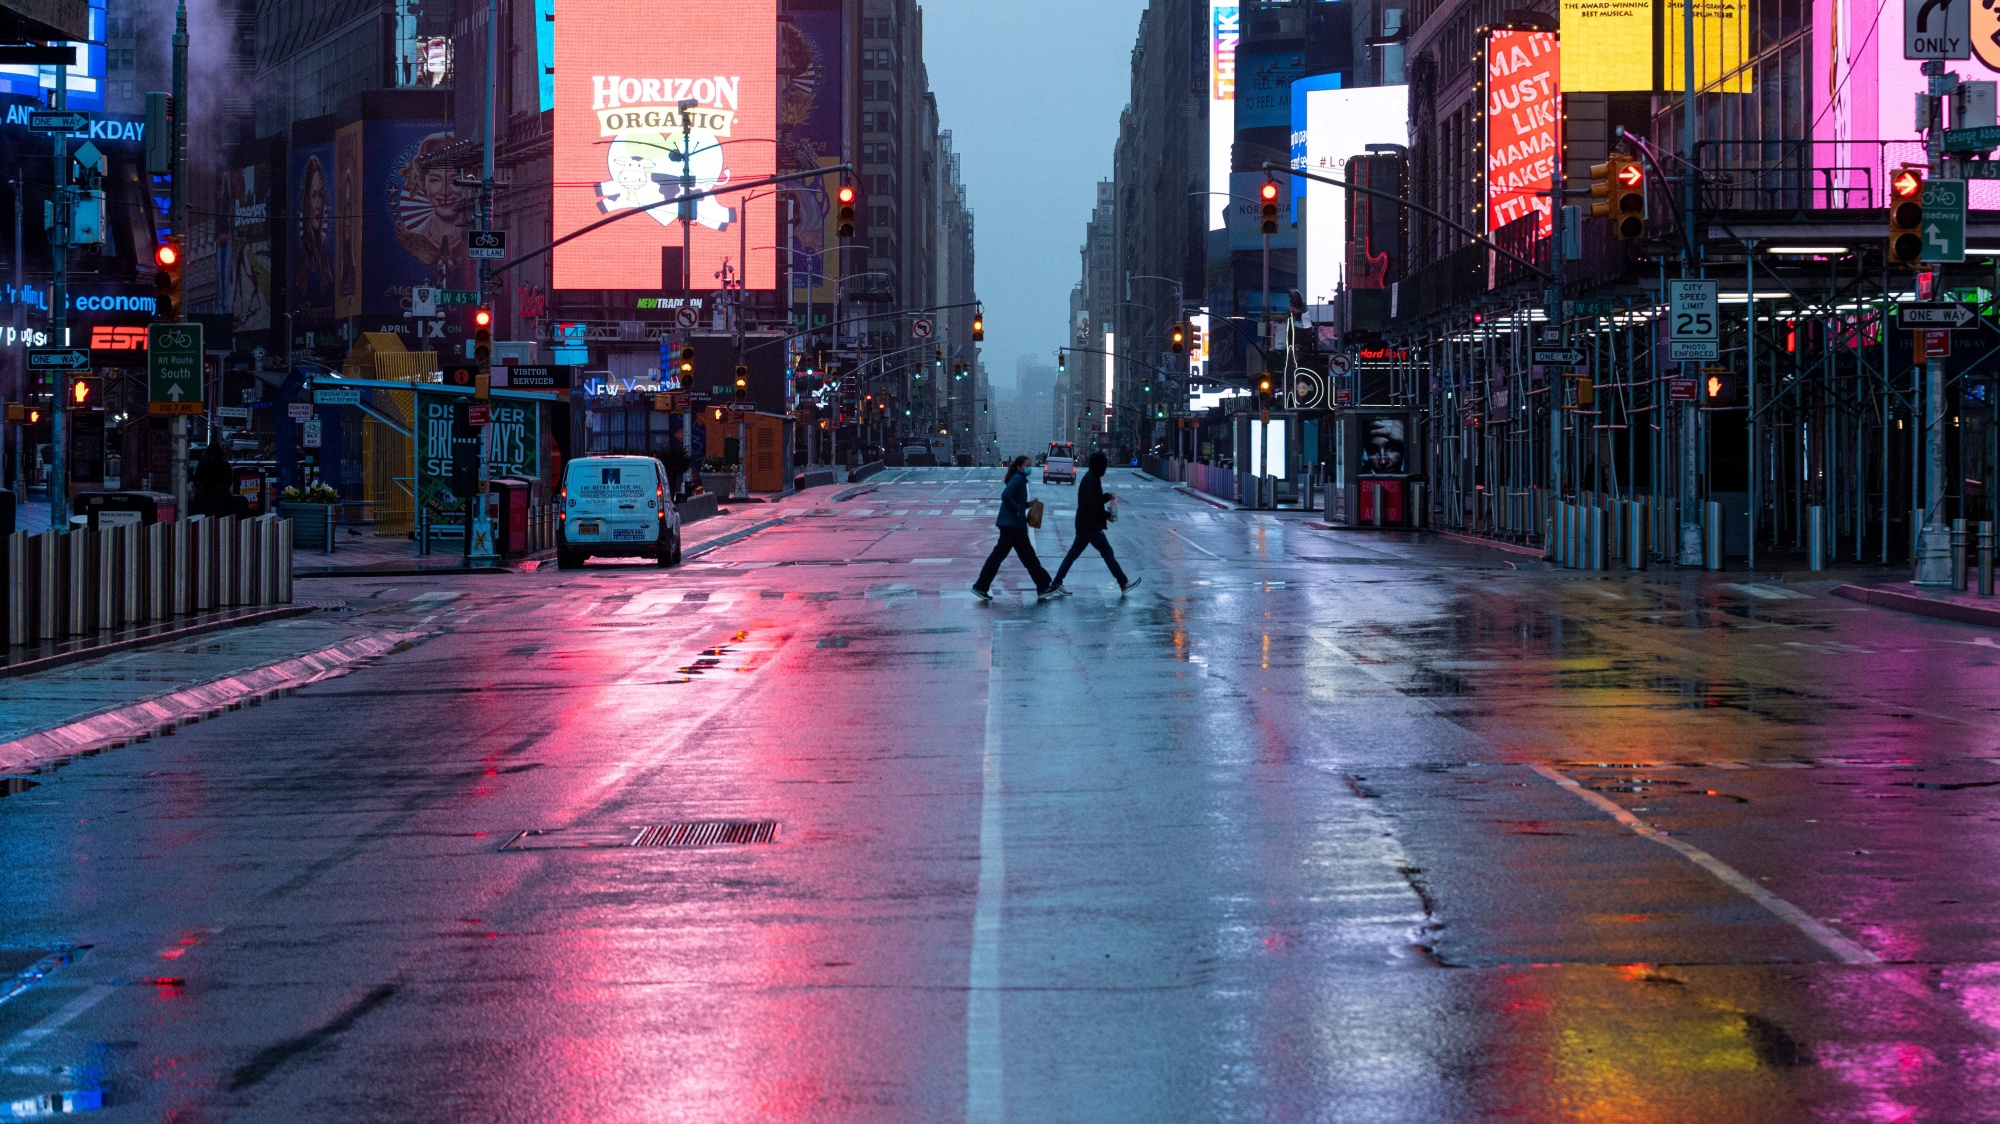 NYC Mayoral Candidate Garcia Focused on Safety, Economy thumbnail